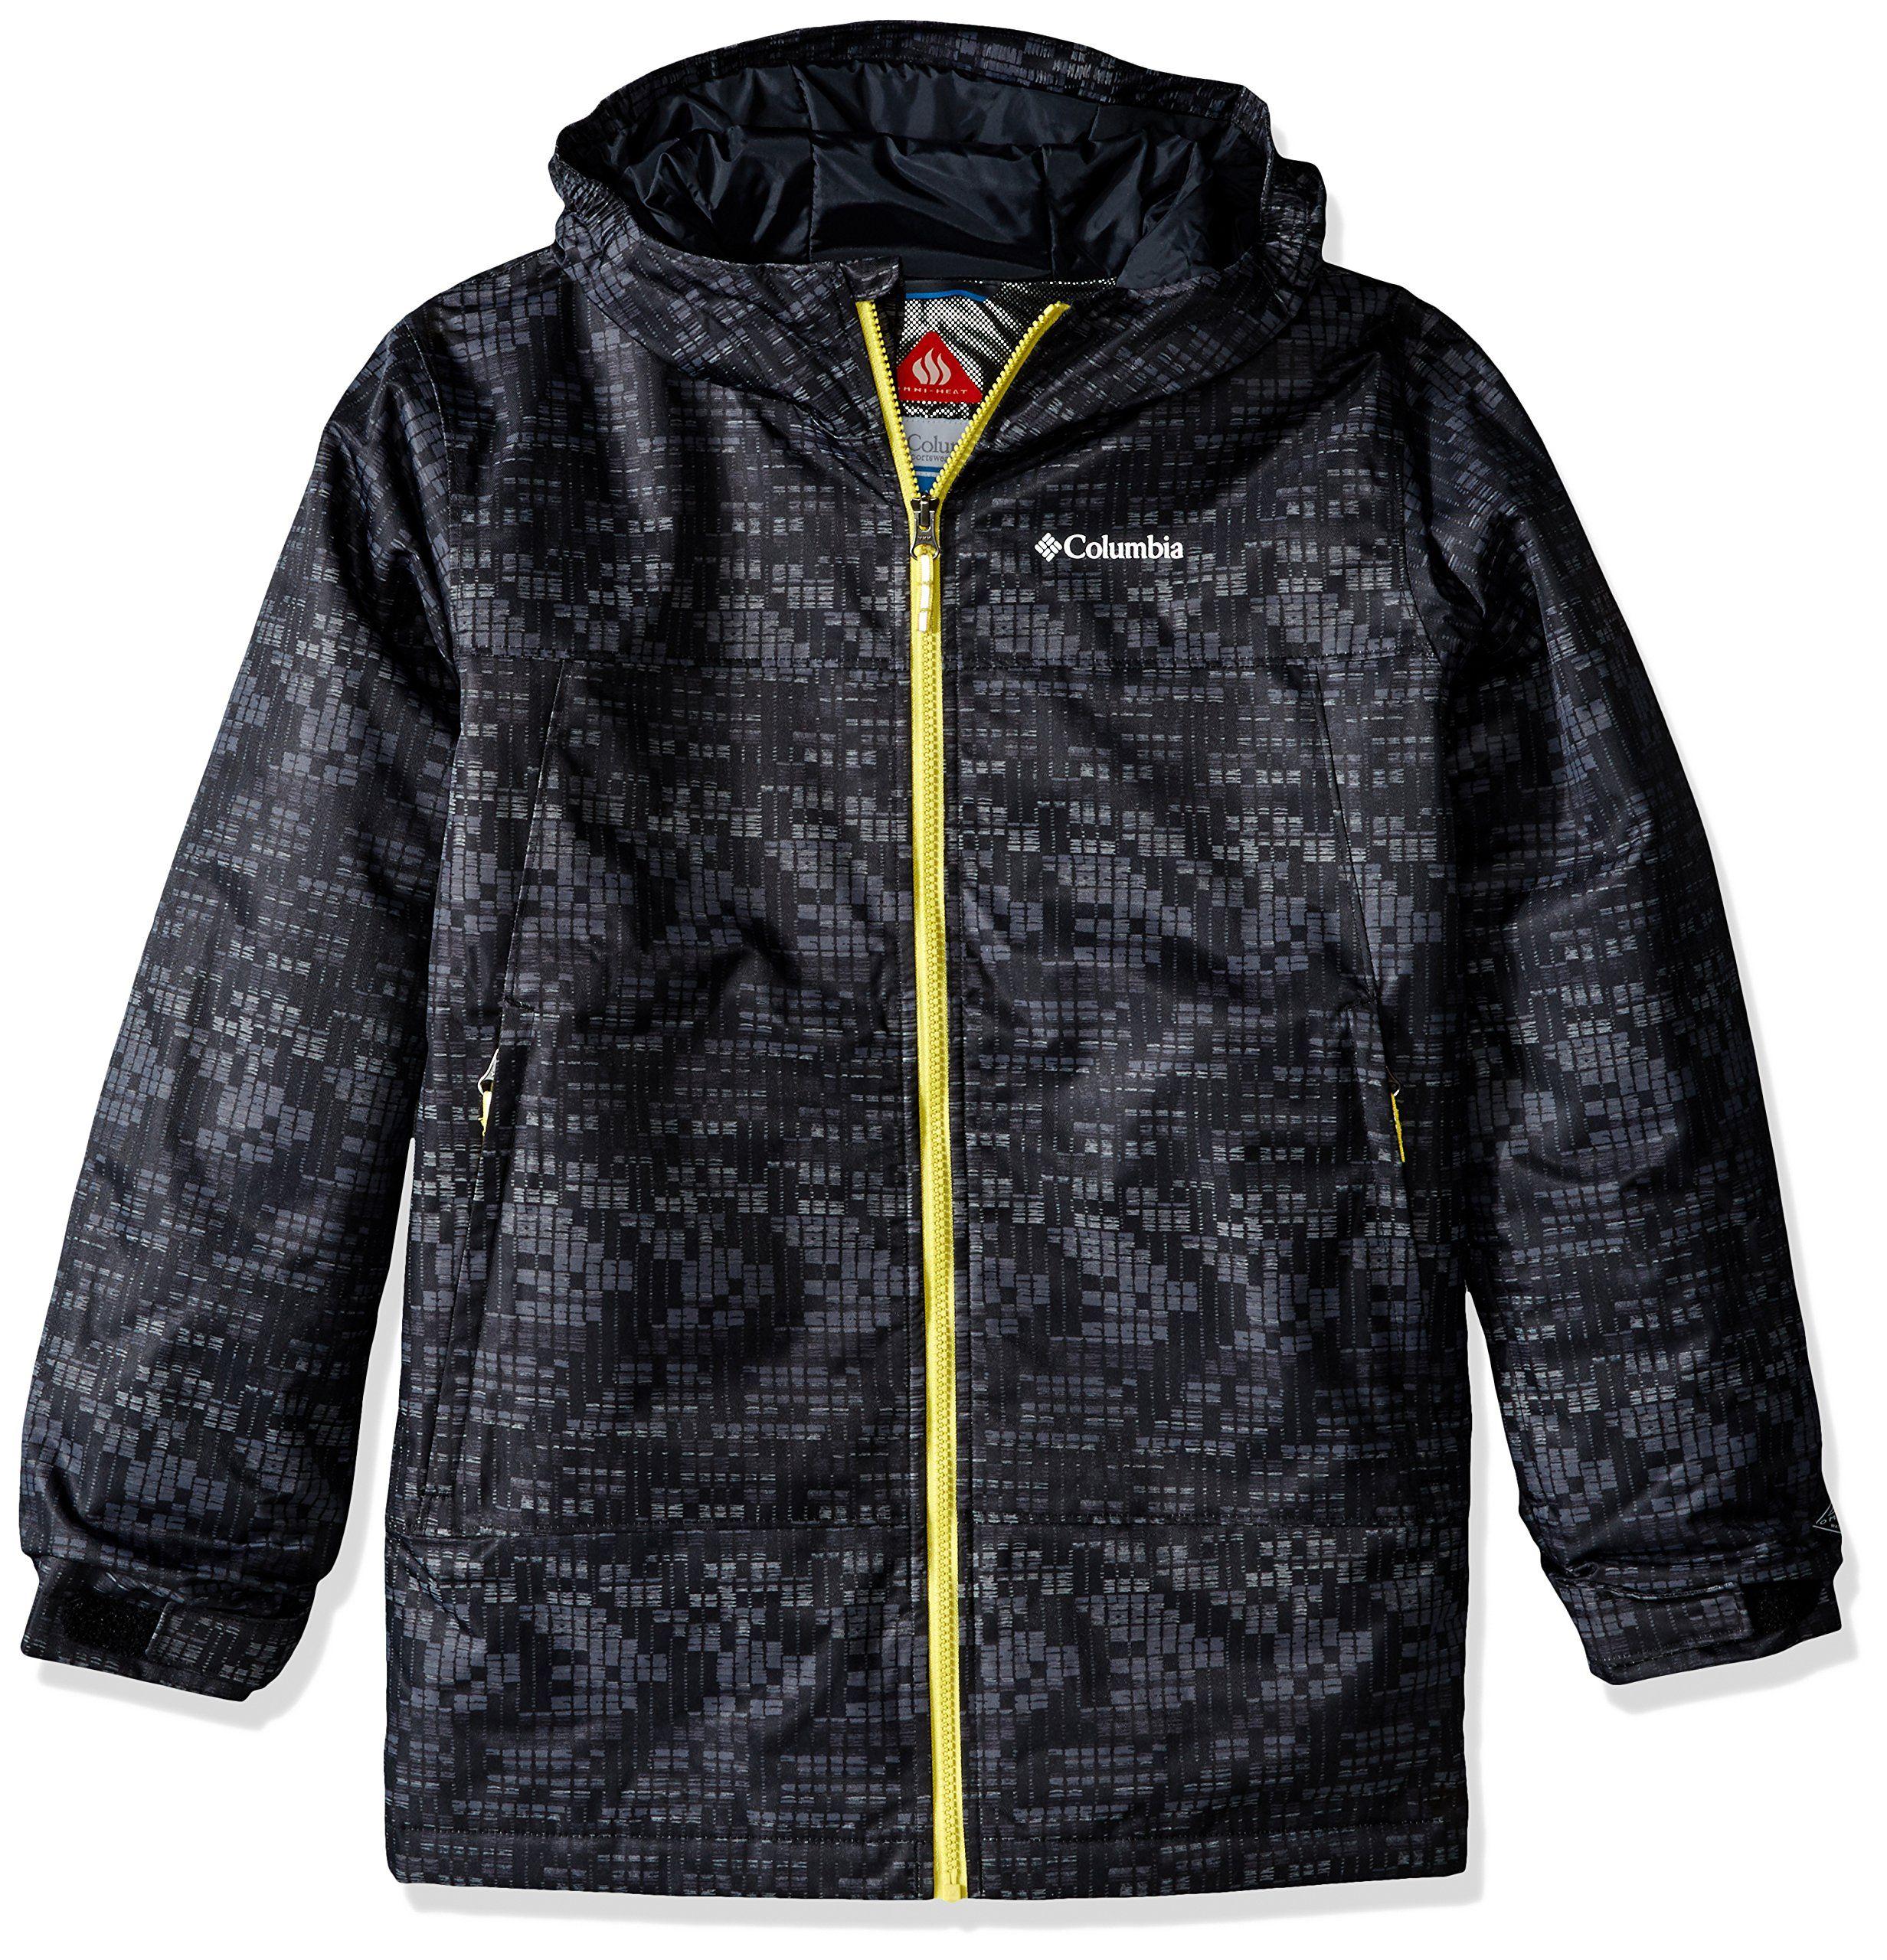 Columbia Boys Wrecktangle Jacket Large Black Matrix Print Omni Heat Thermal Reflective Wind Proof Insulated 100gsm Jackets Hooded Jacket Athletic Jacket [ 2560 x 2464 Pixel ]